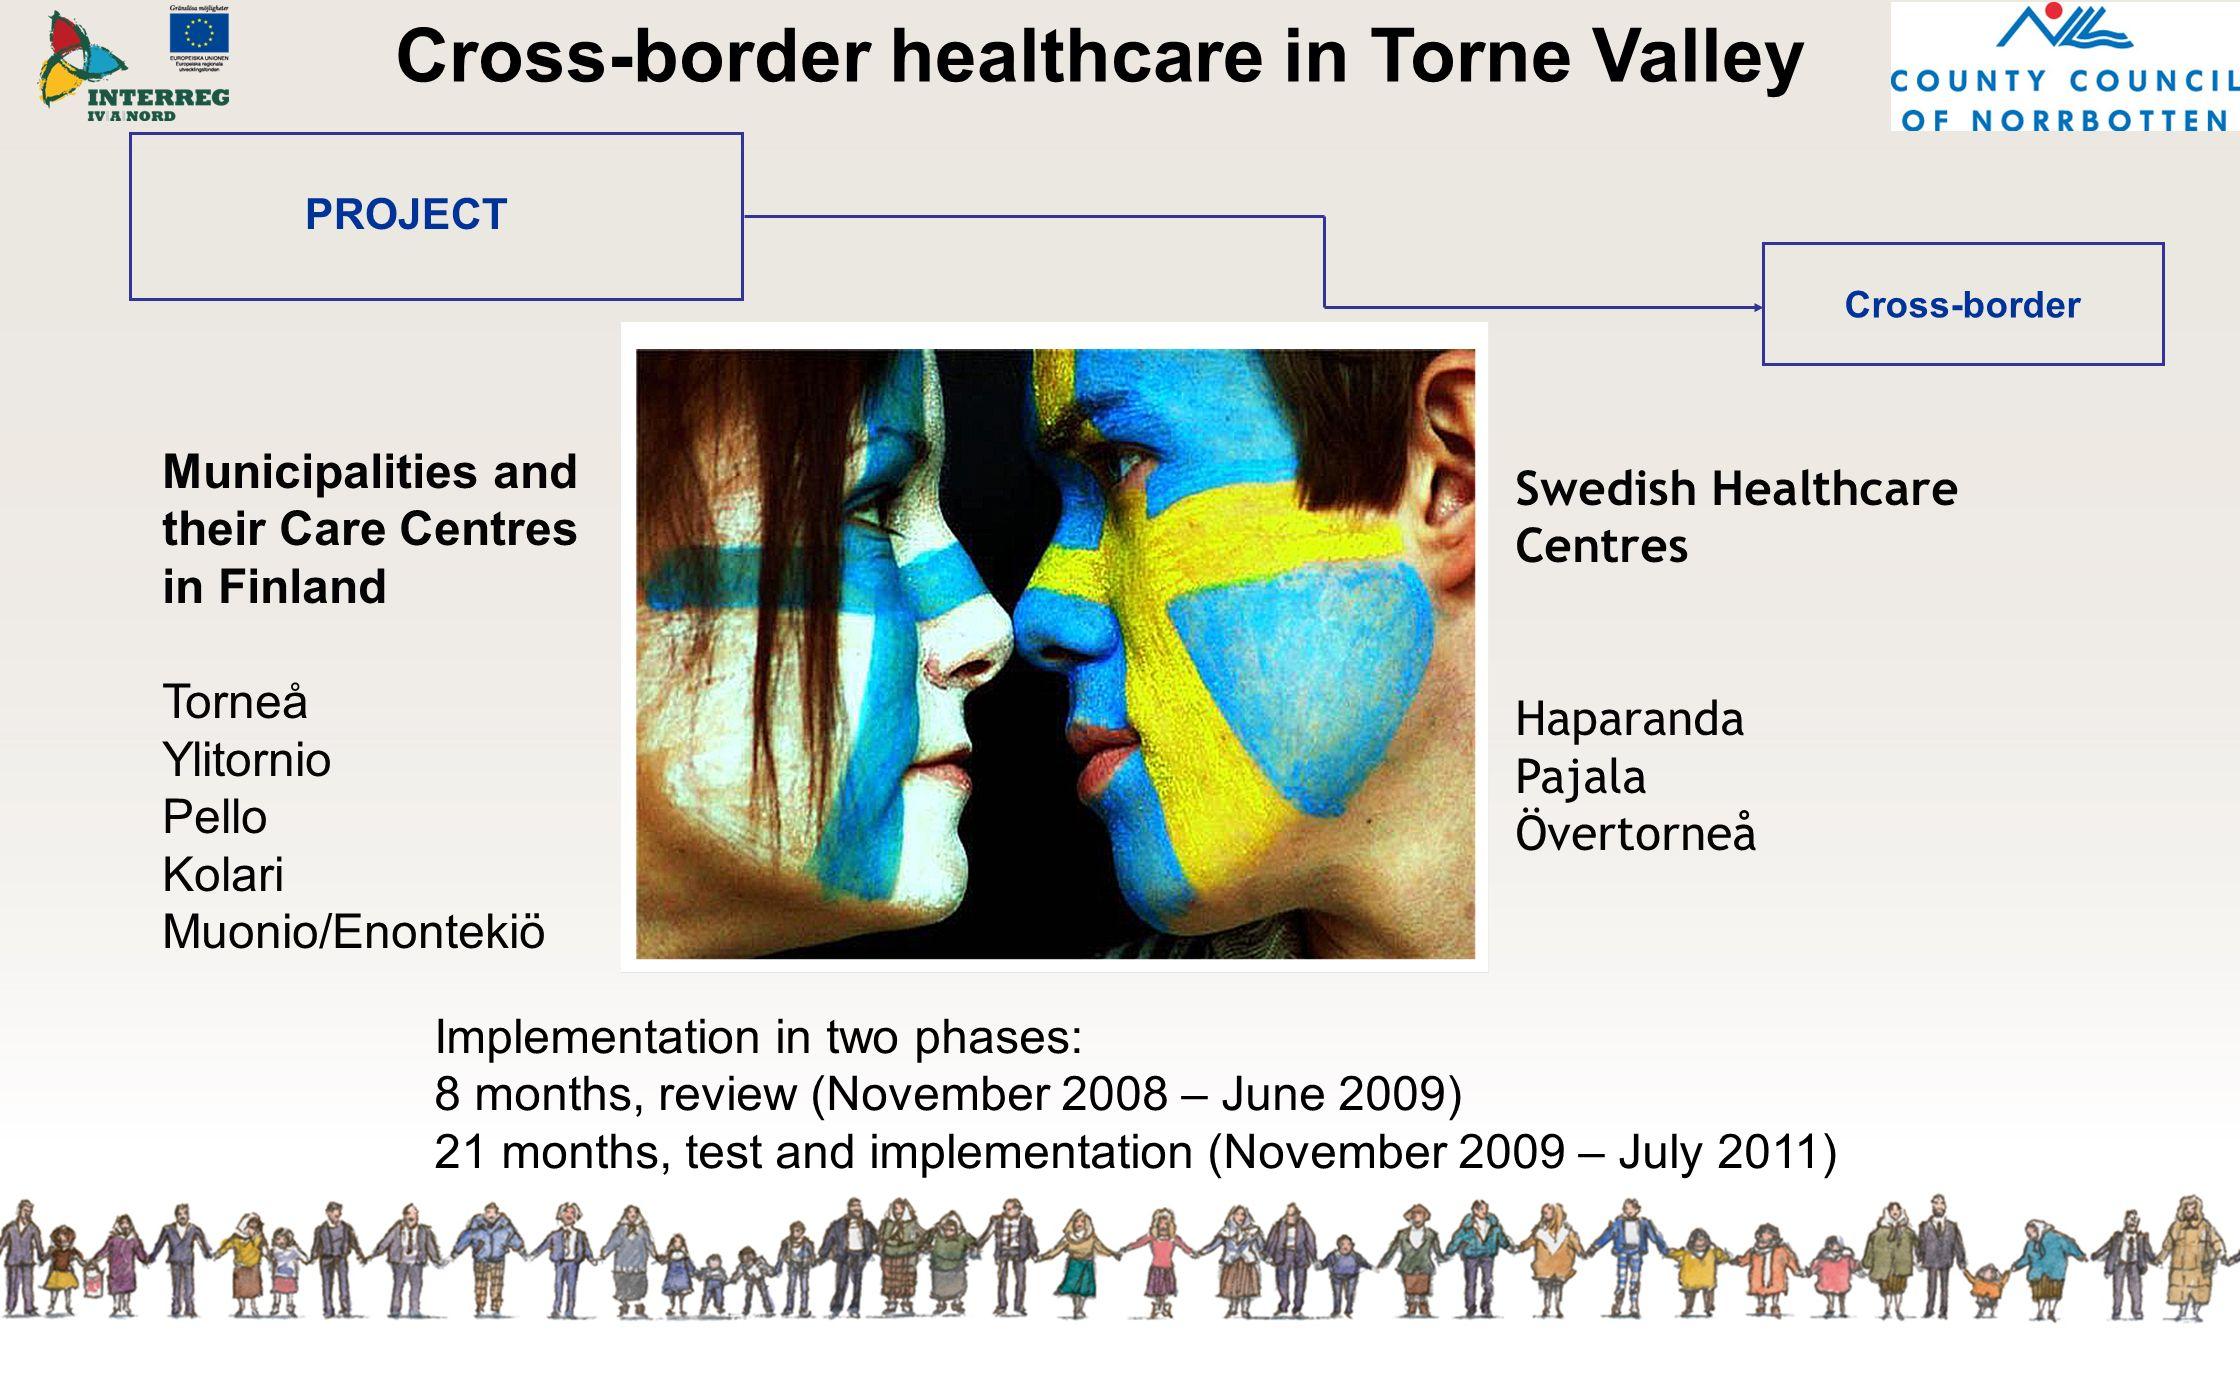 Cross-border healthcare in Torne Valley